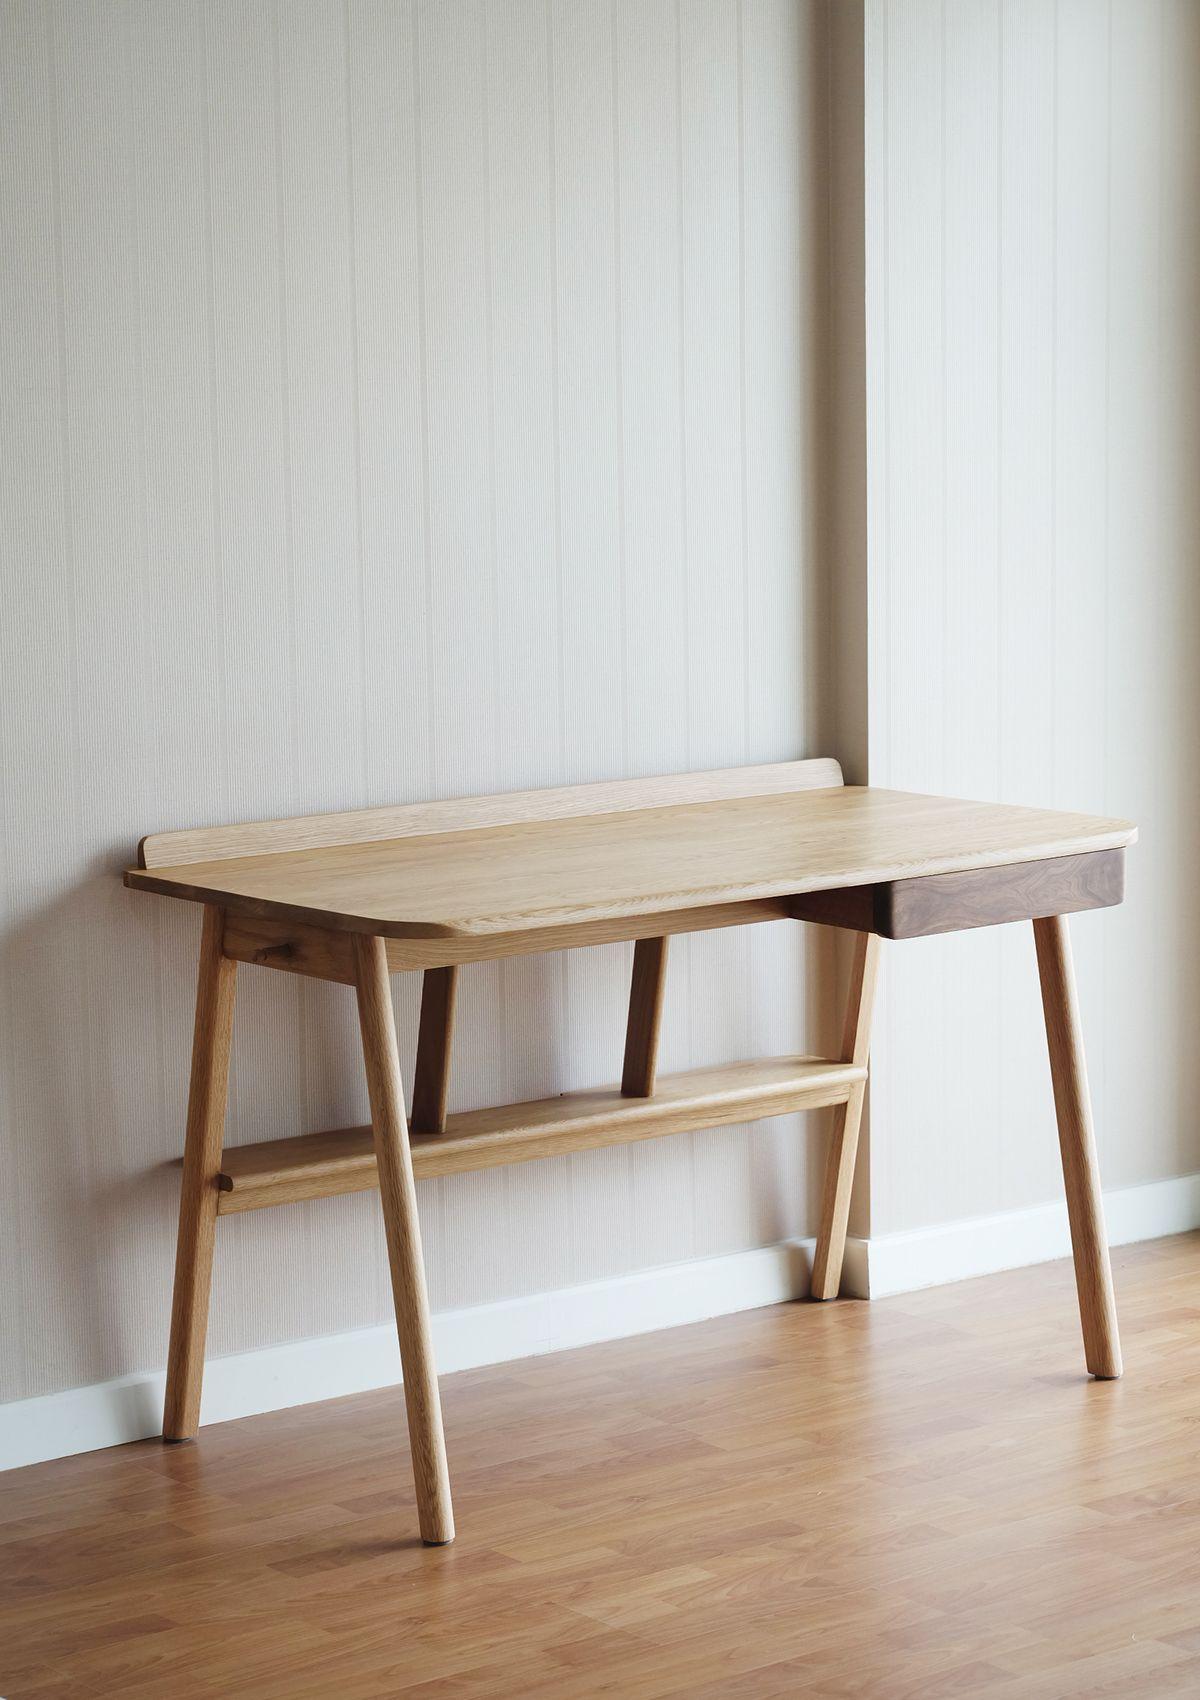 chair design bangkok ijoy massage costco kitt desk minimalist and